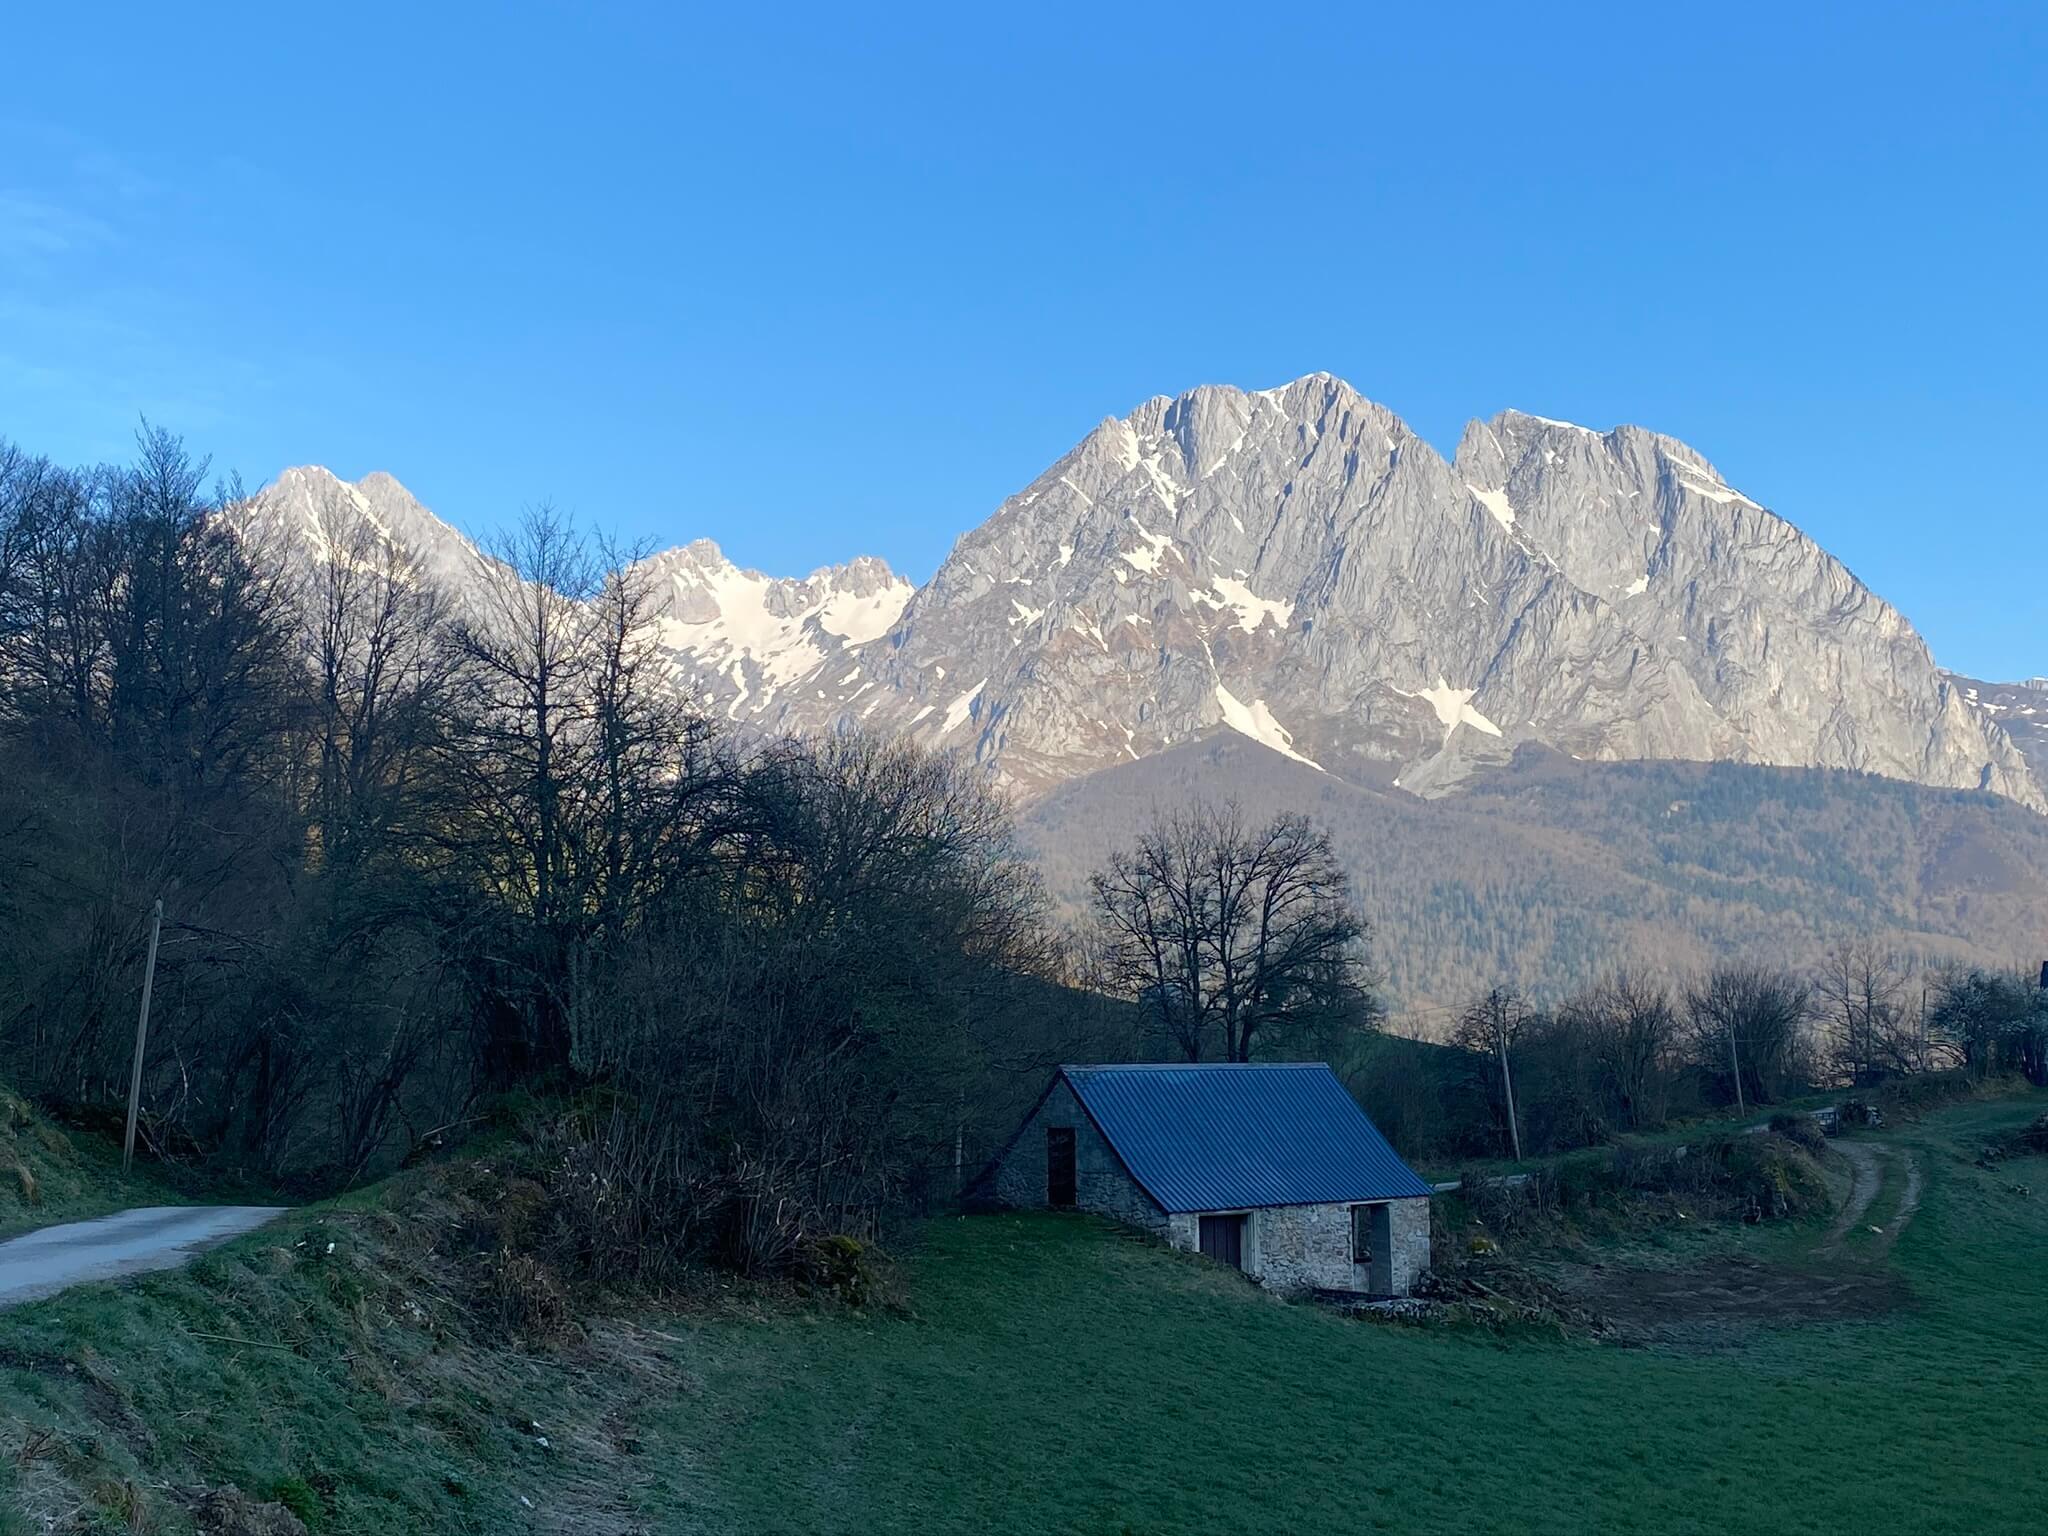 Le Billare (2318 m), un incontournable de la vallée d'Aspe